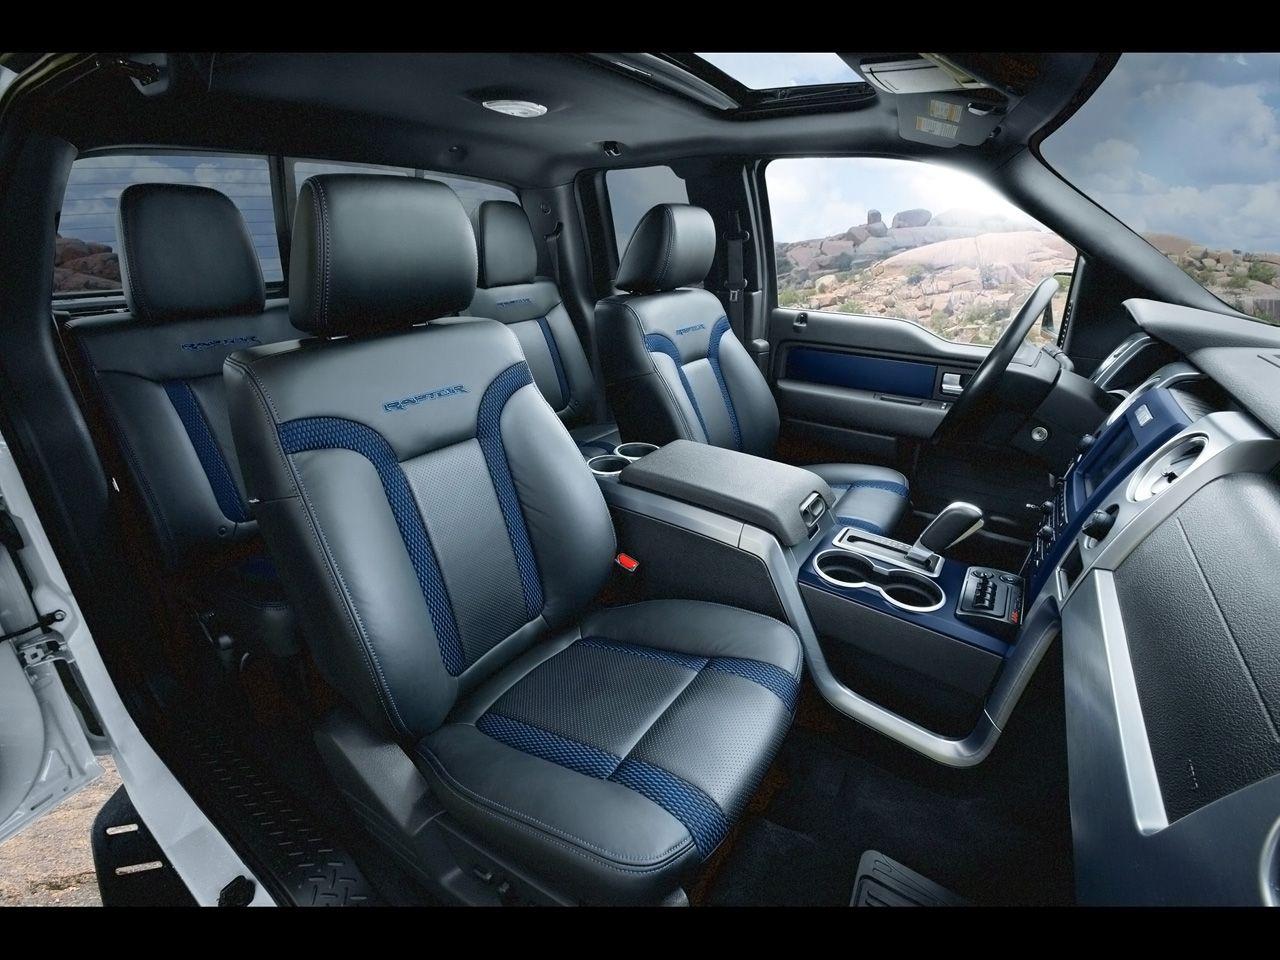 2012 Ford F 150 Svt Raptor Interior My Truck My Truck